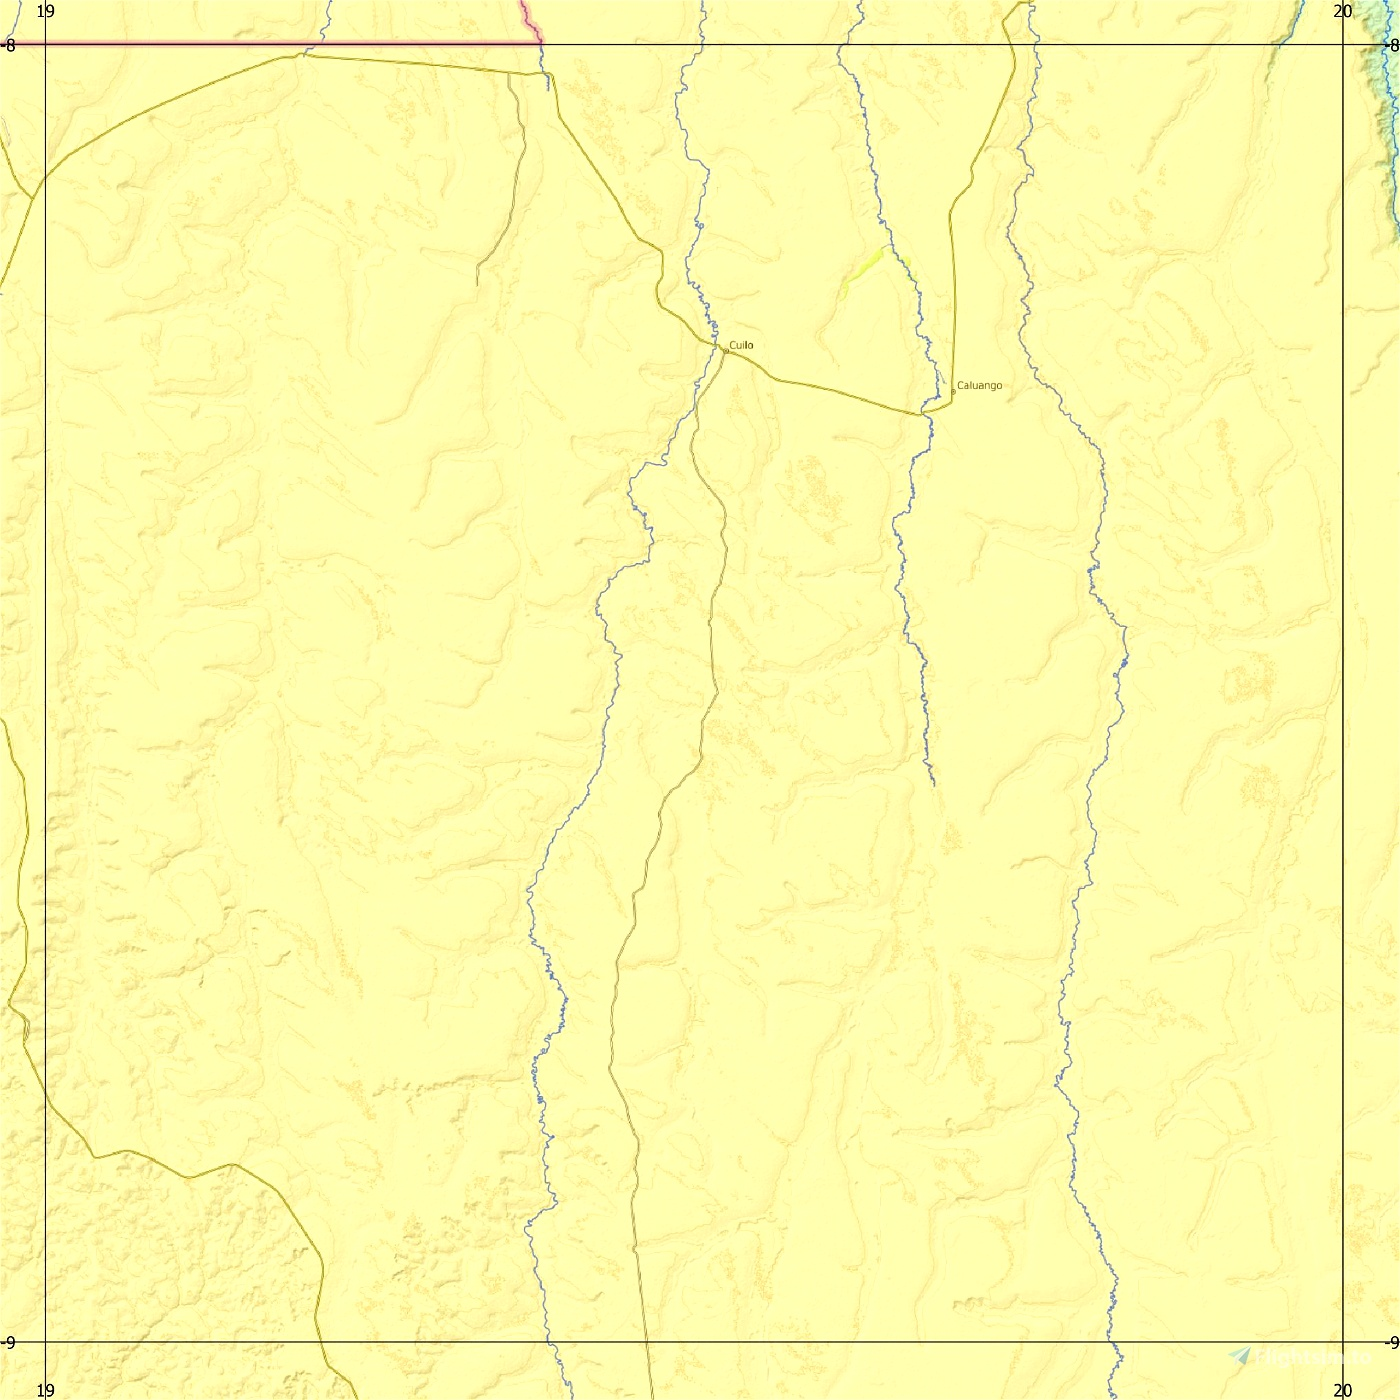 Angola ETM12 Enhanced Terrain Mesh 12m vol_03 -Lunda Norte